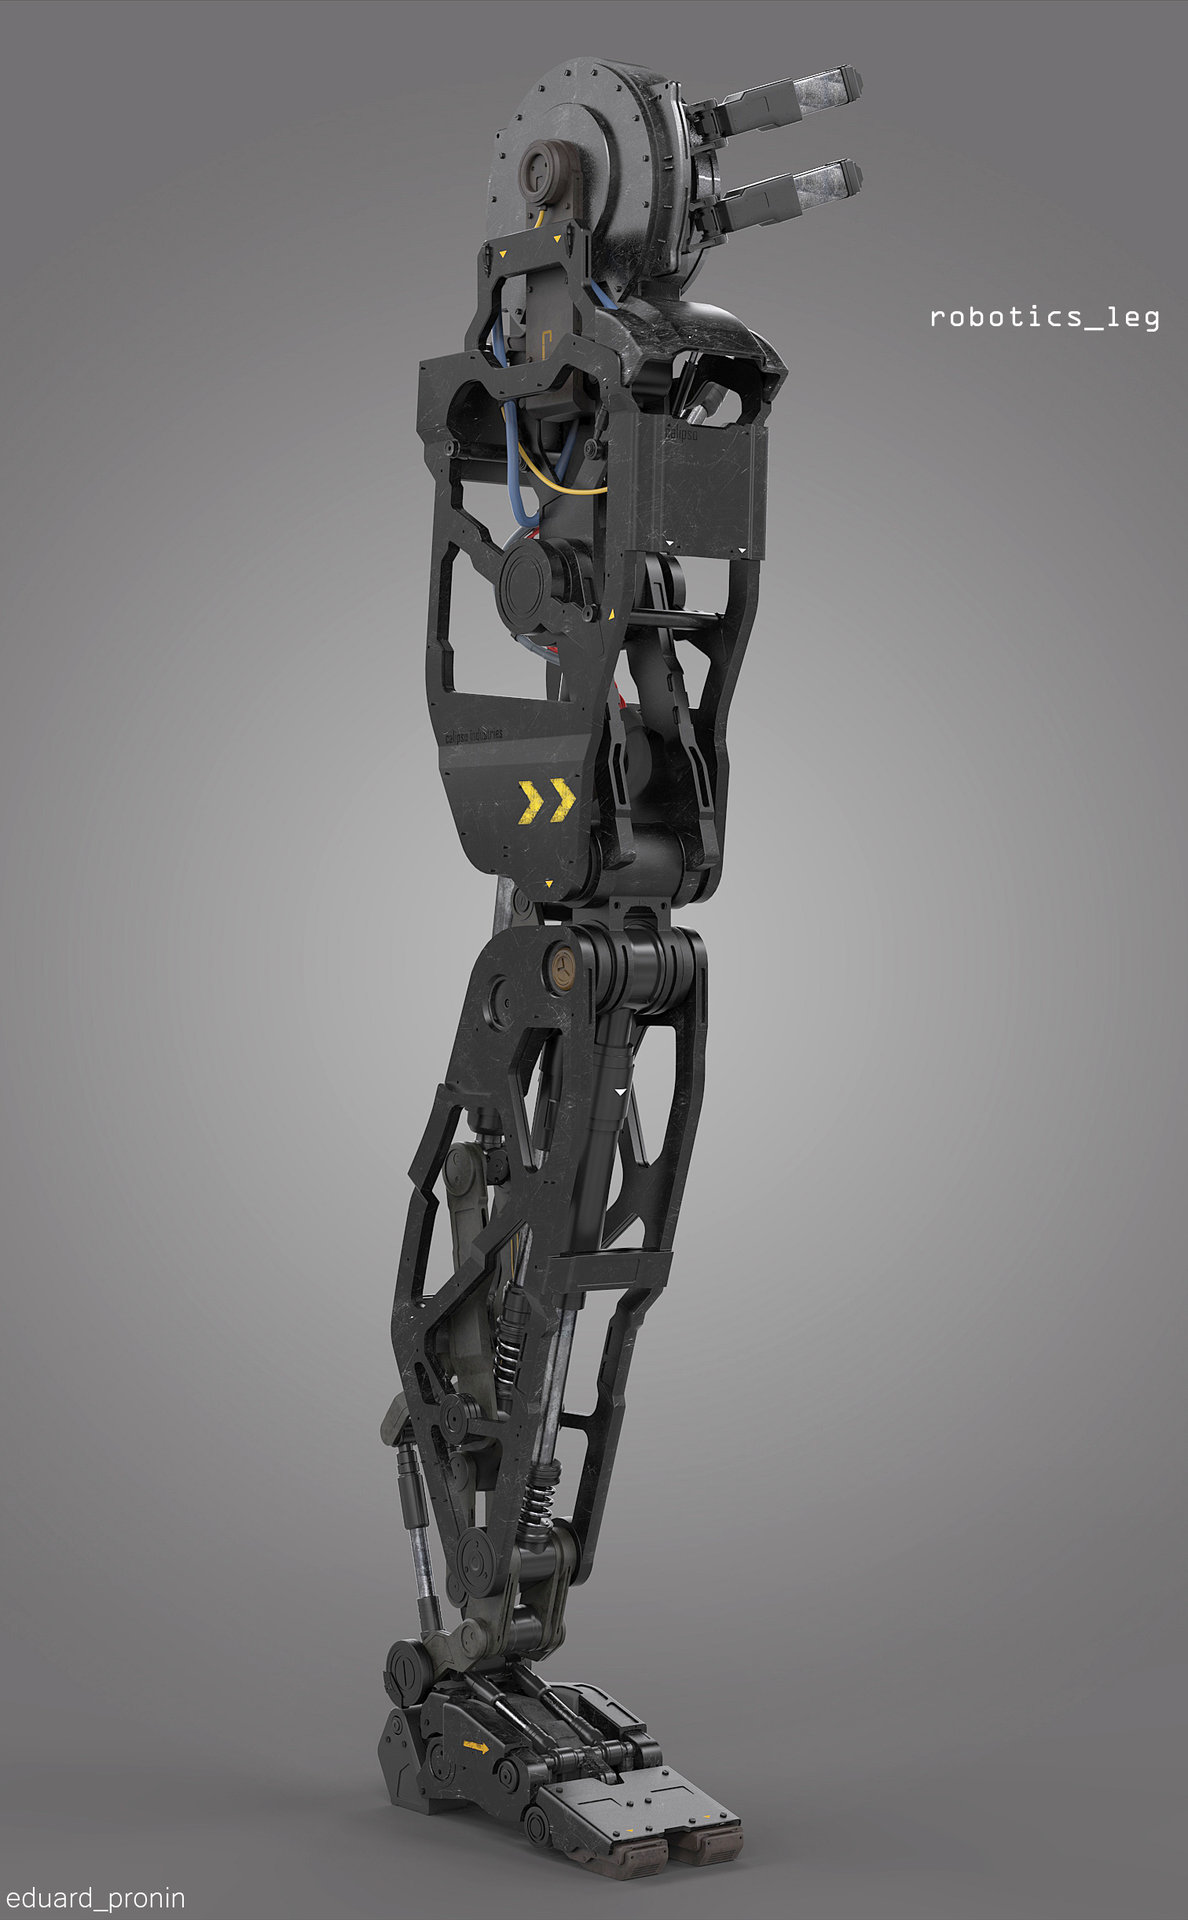 Eduard pronin leg texture1